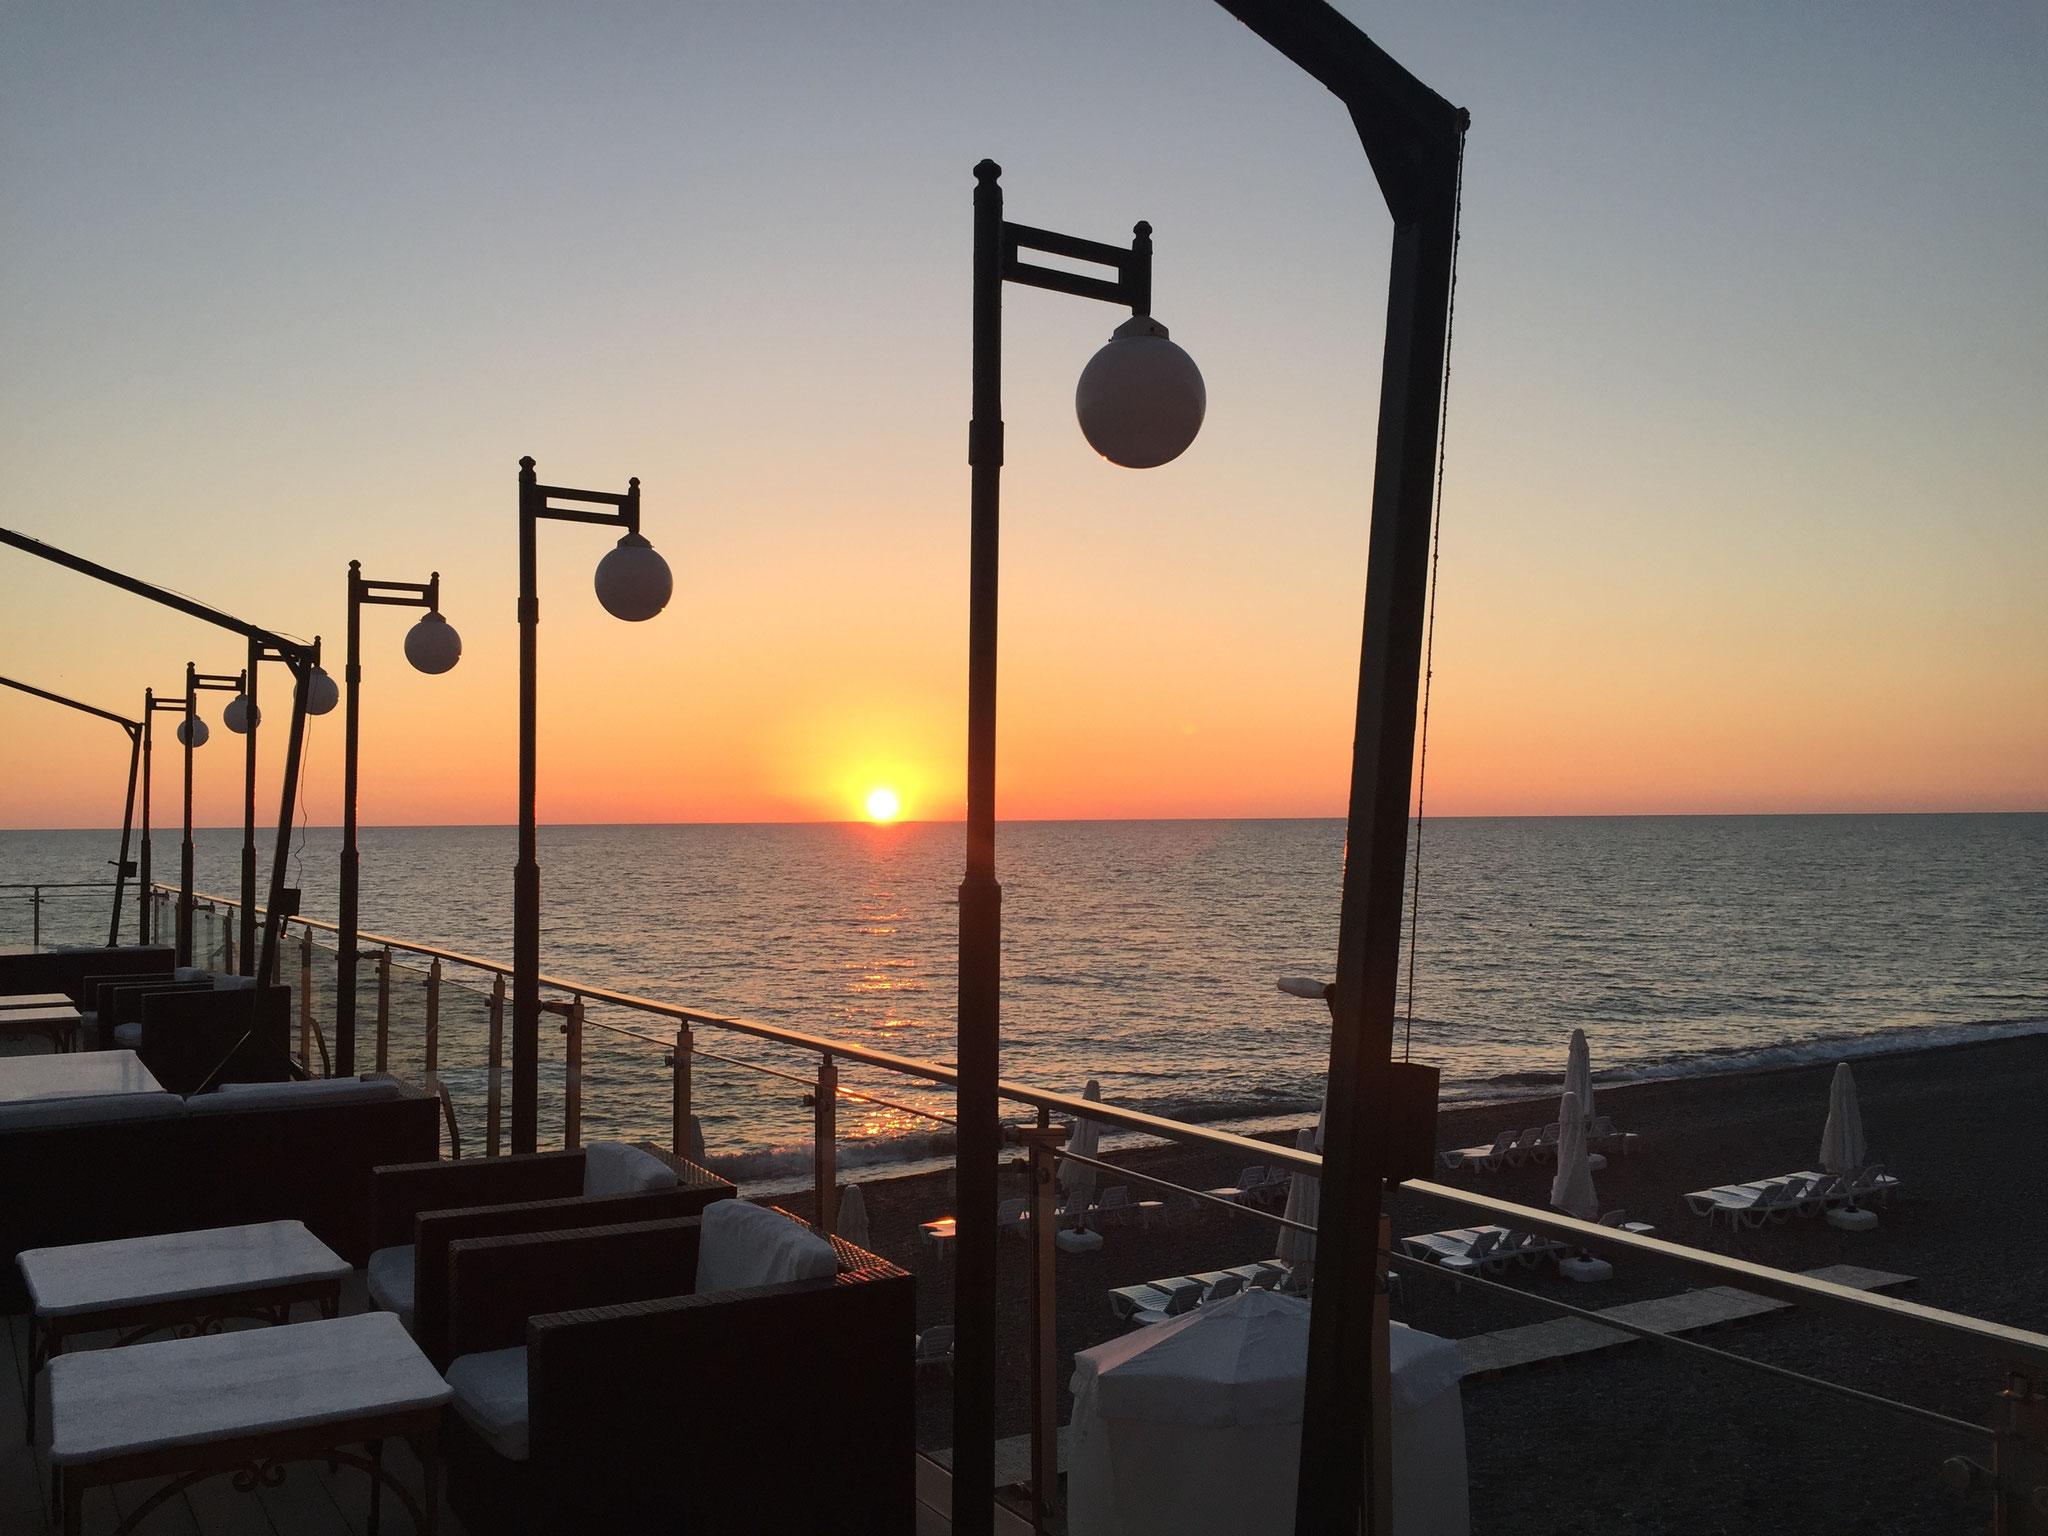 Sonnenuntergang am Schwarzen Meer